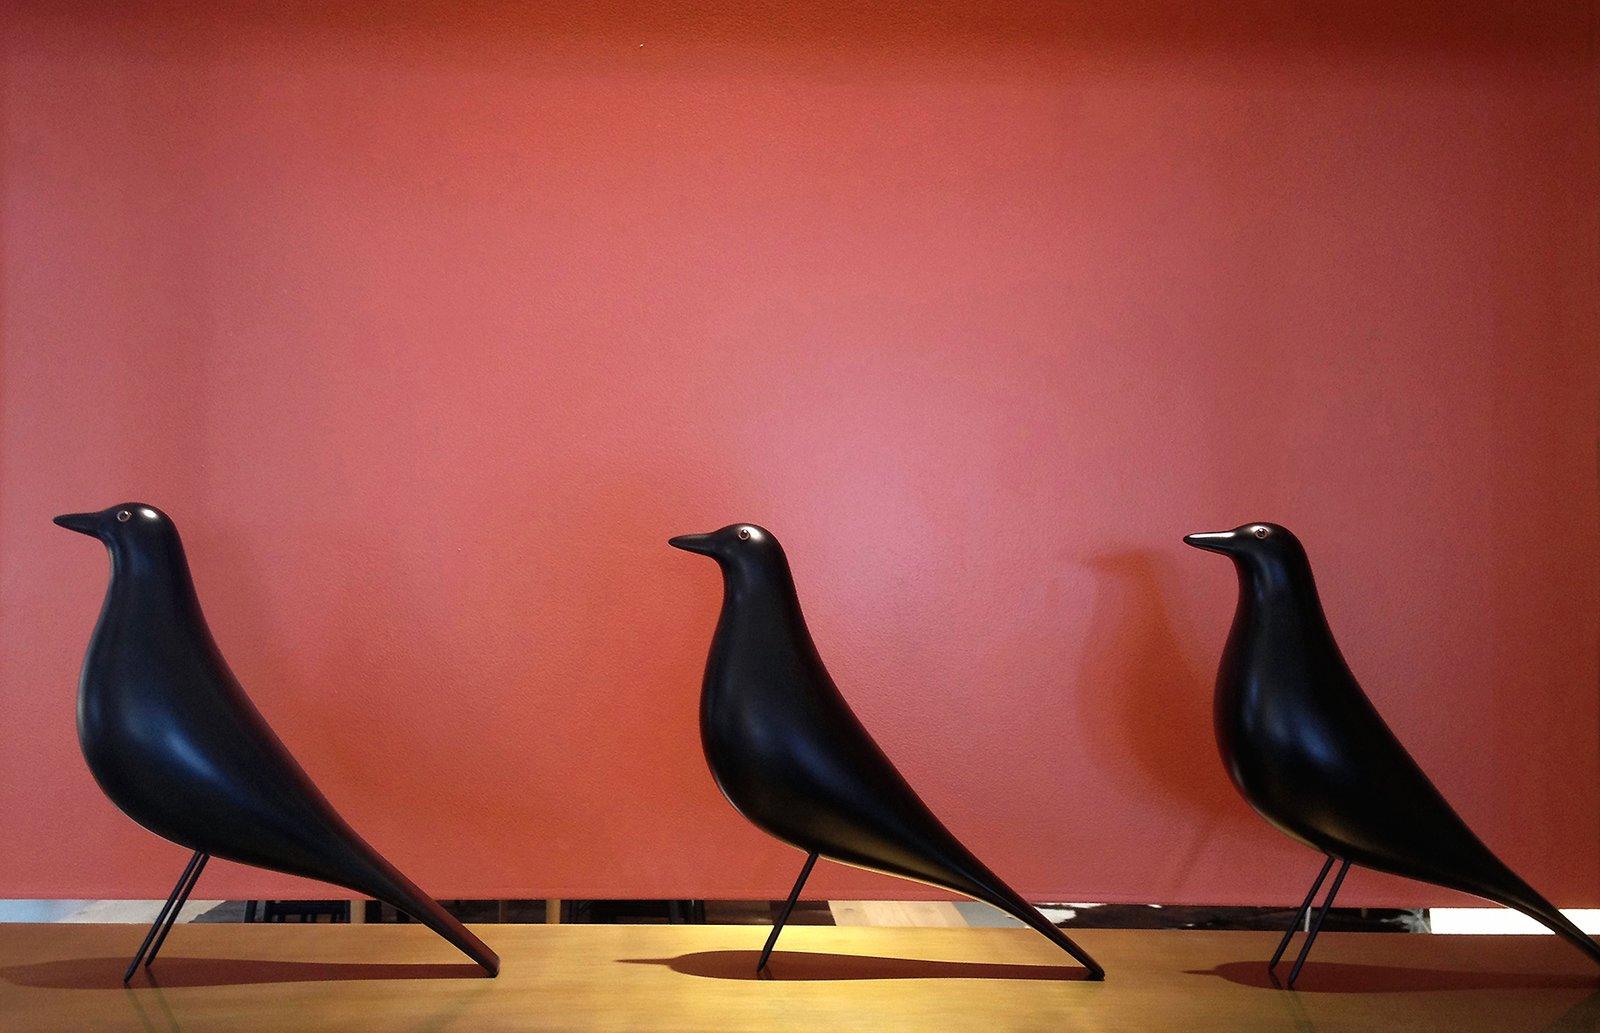 eames house bird(s)  Mid century modern